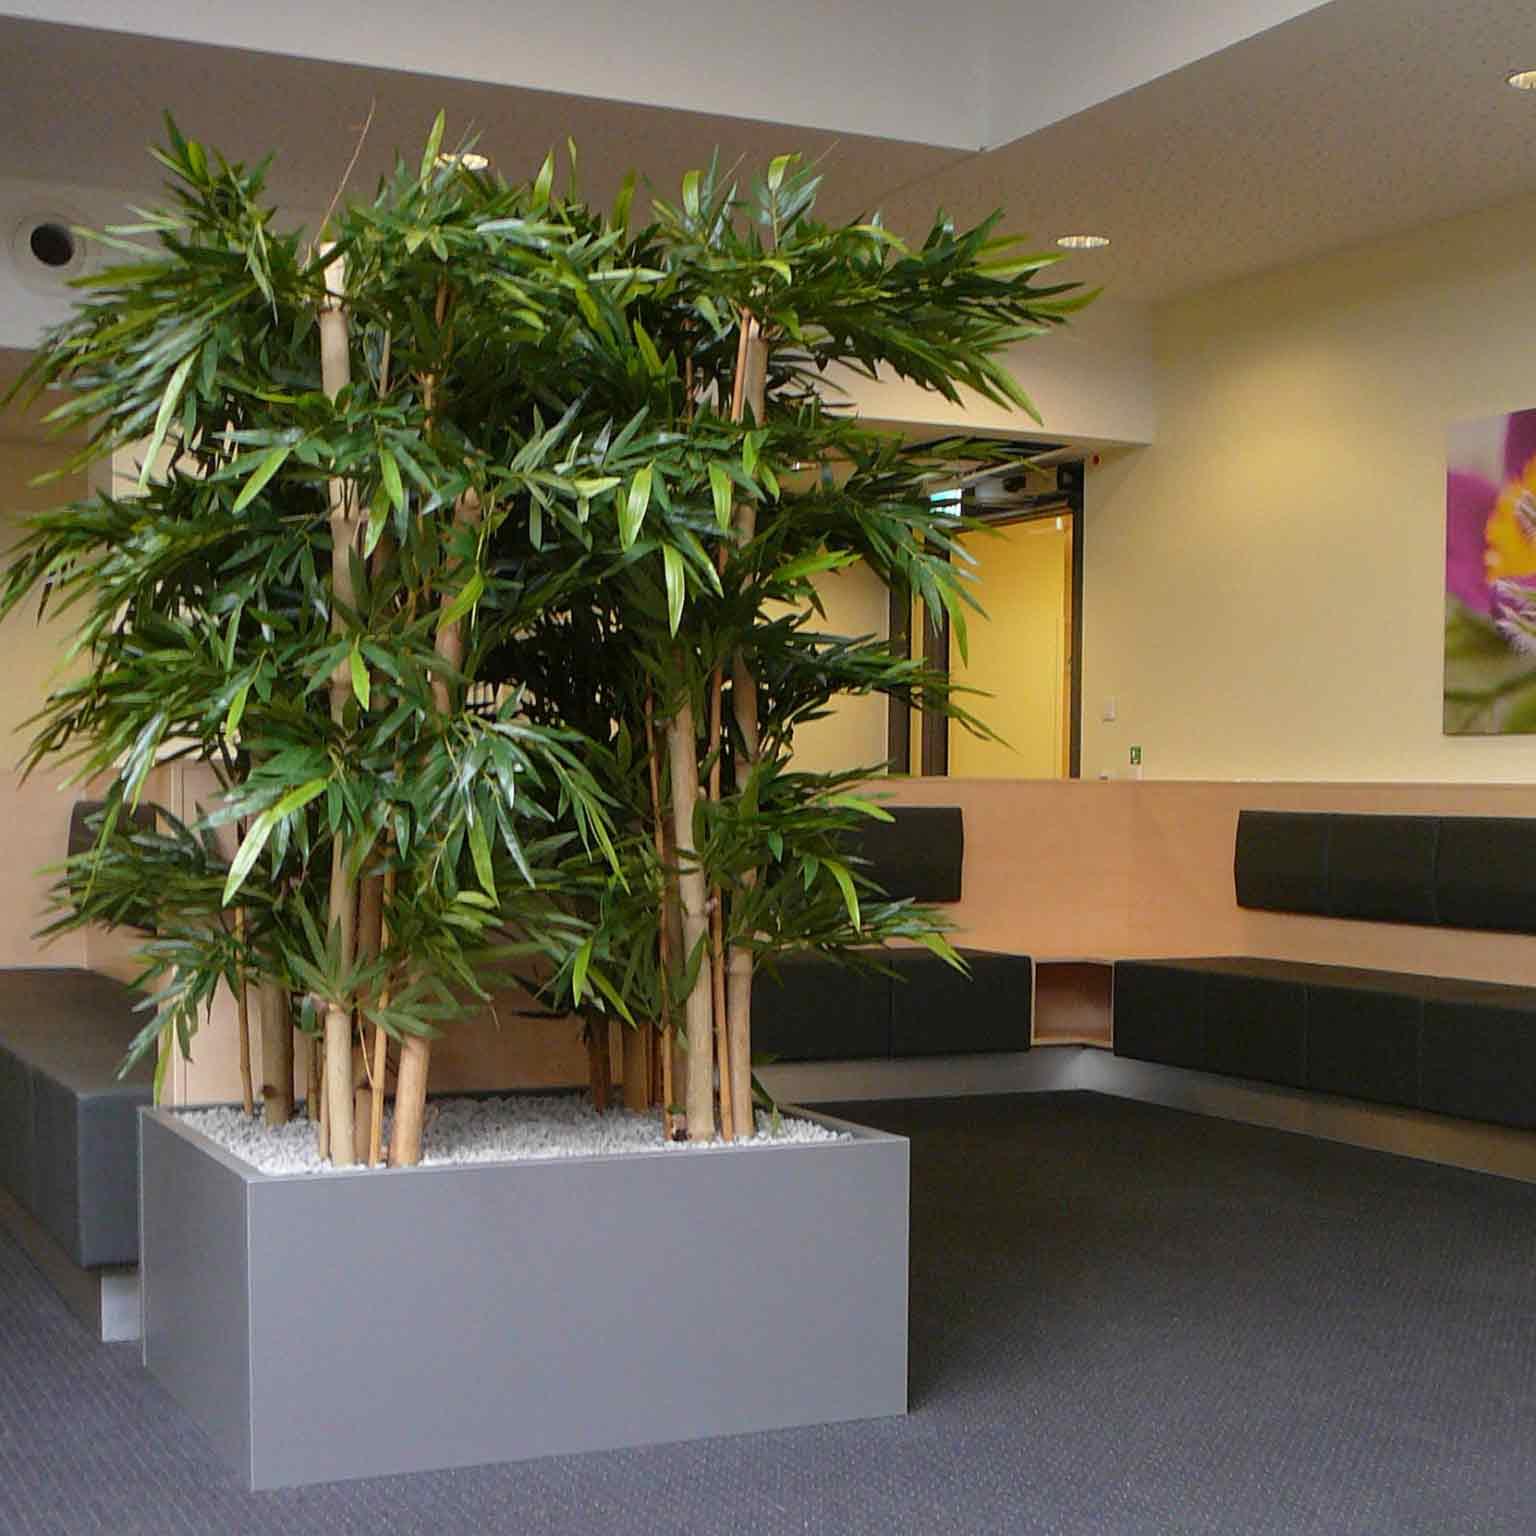 Pflanzbecken mit Bambus - Kunstpflanze, akzente raumbegrünung